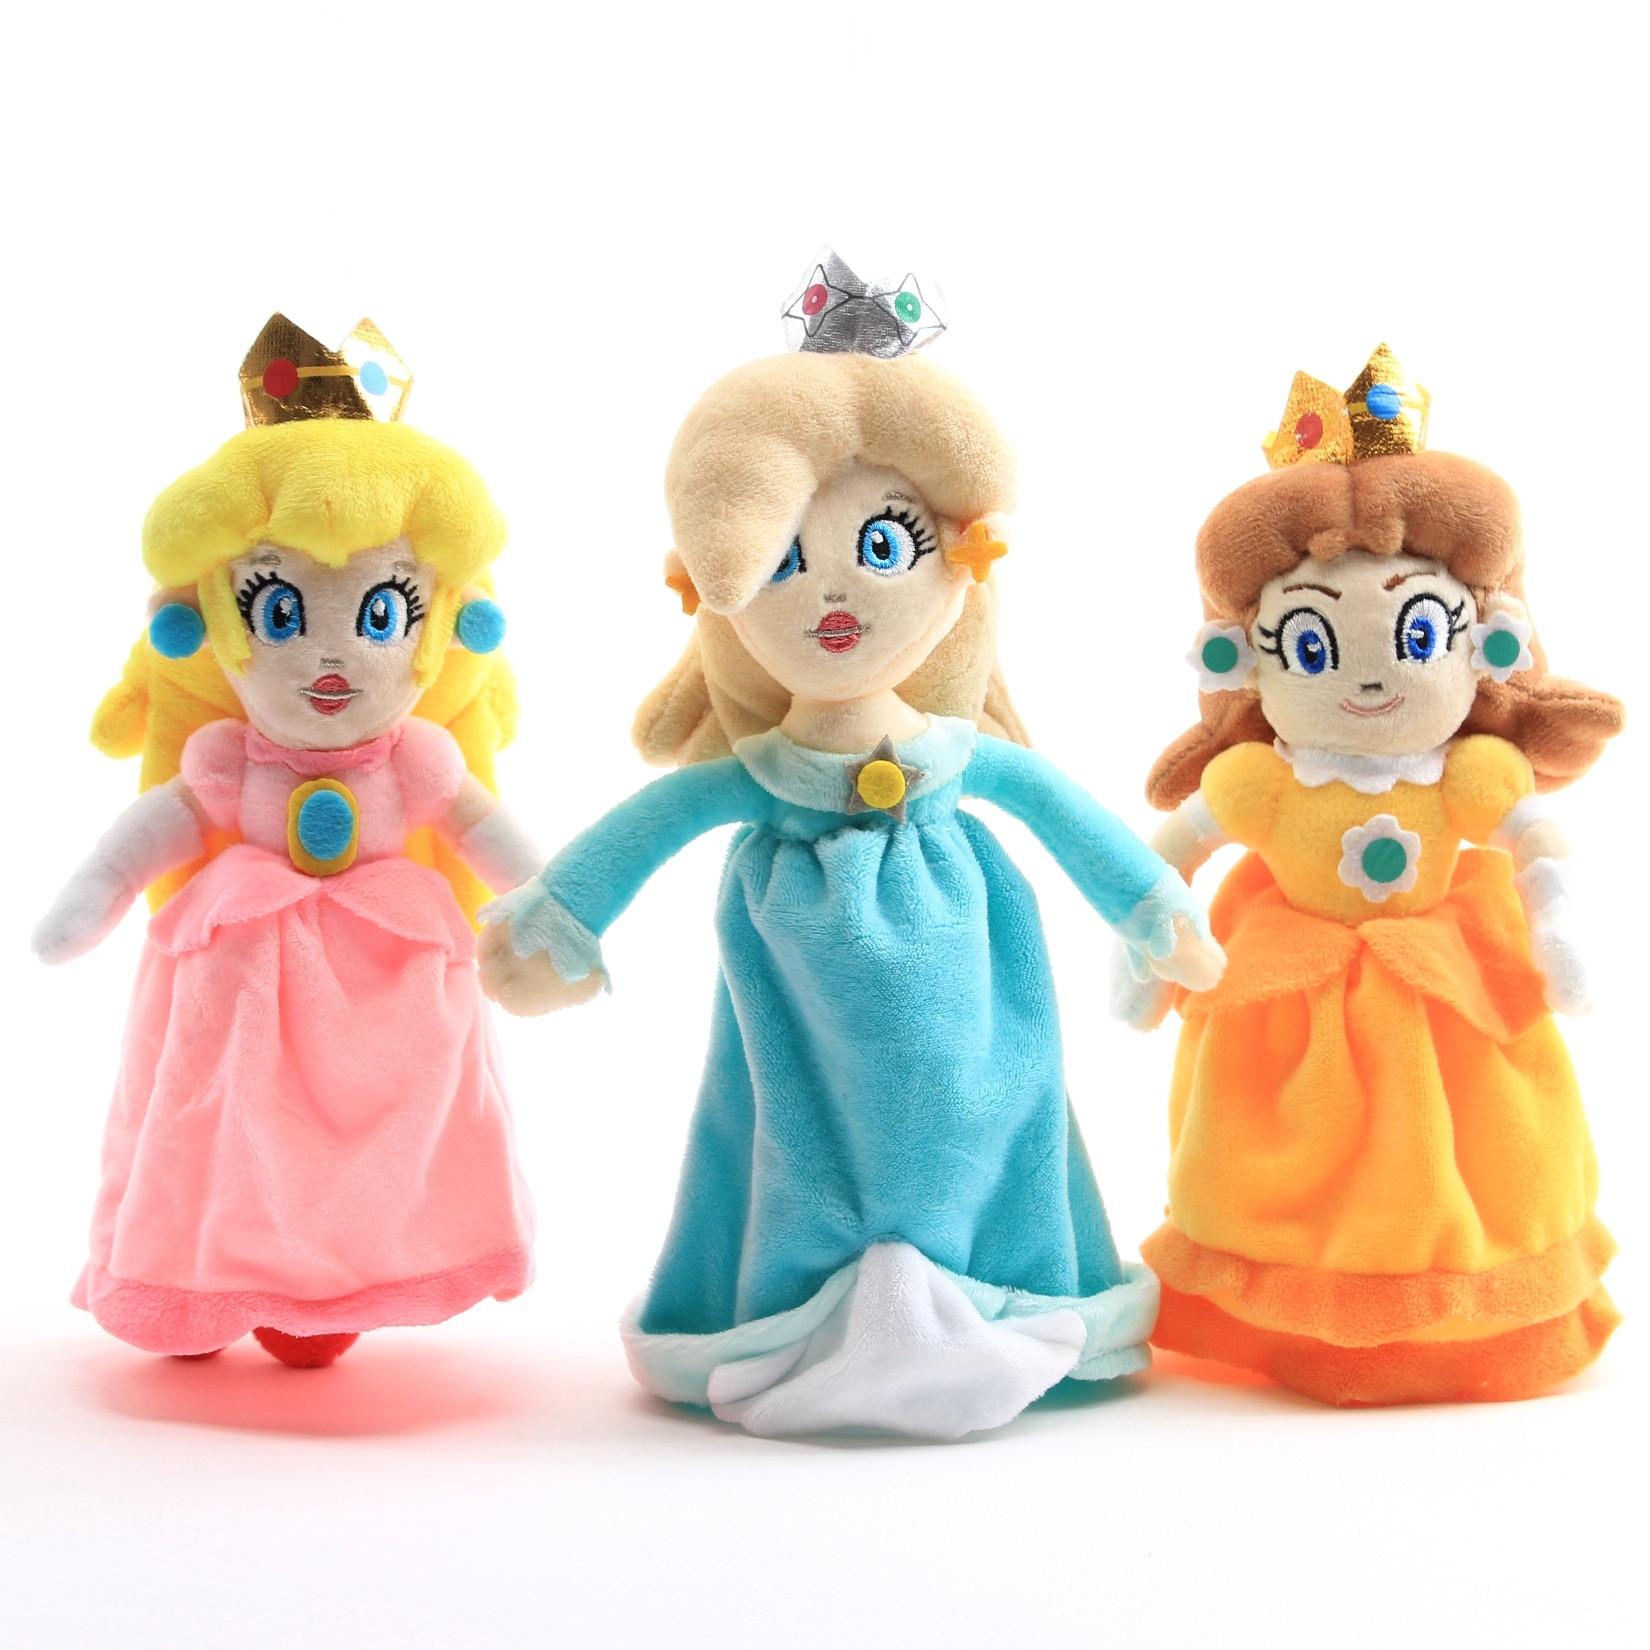 20cm Mario Series Lovely Princess Peach Rosalina Princess Daisy Rosalina Plush Toy Doll Children Kids Birthday Gift